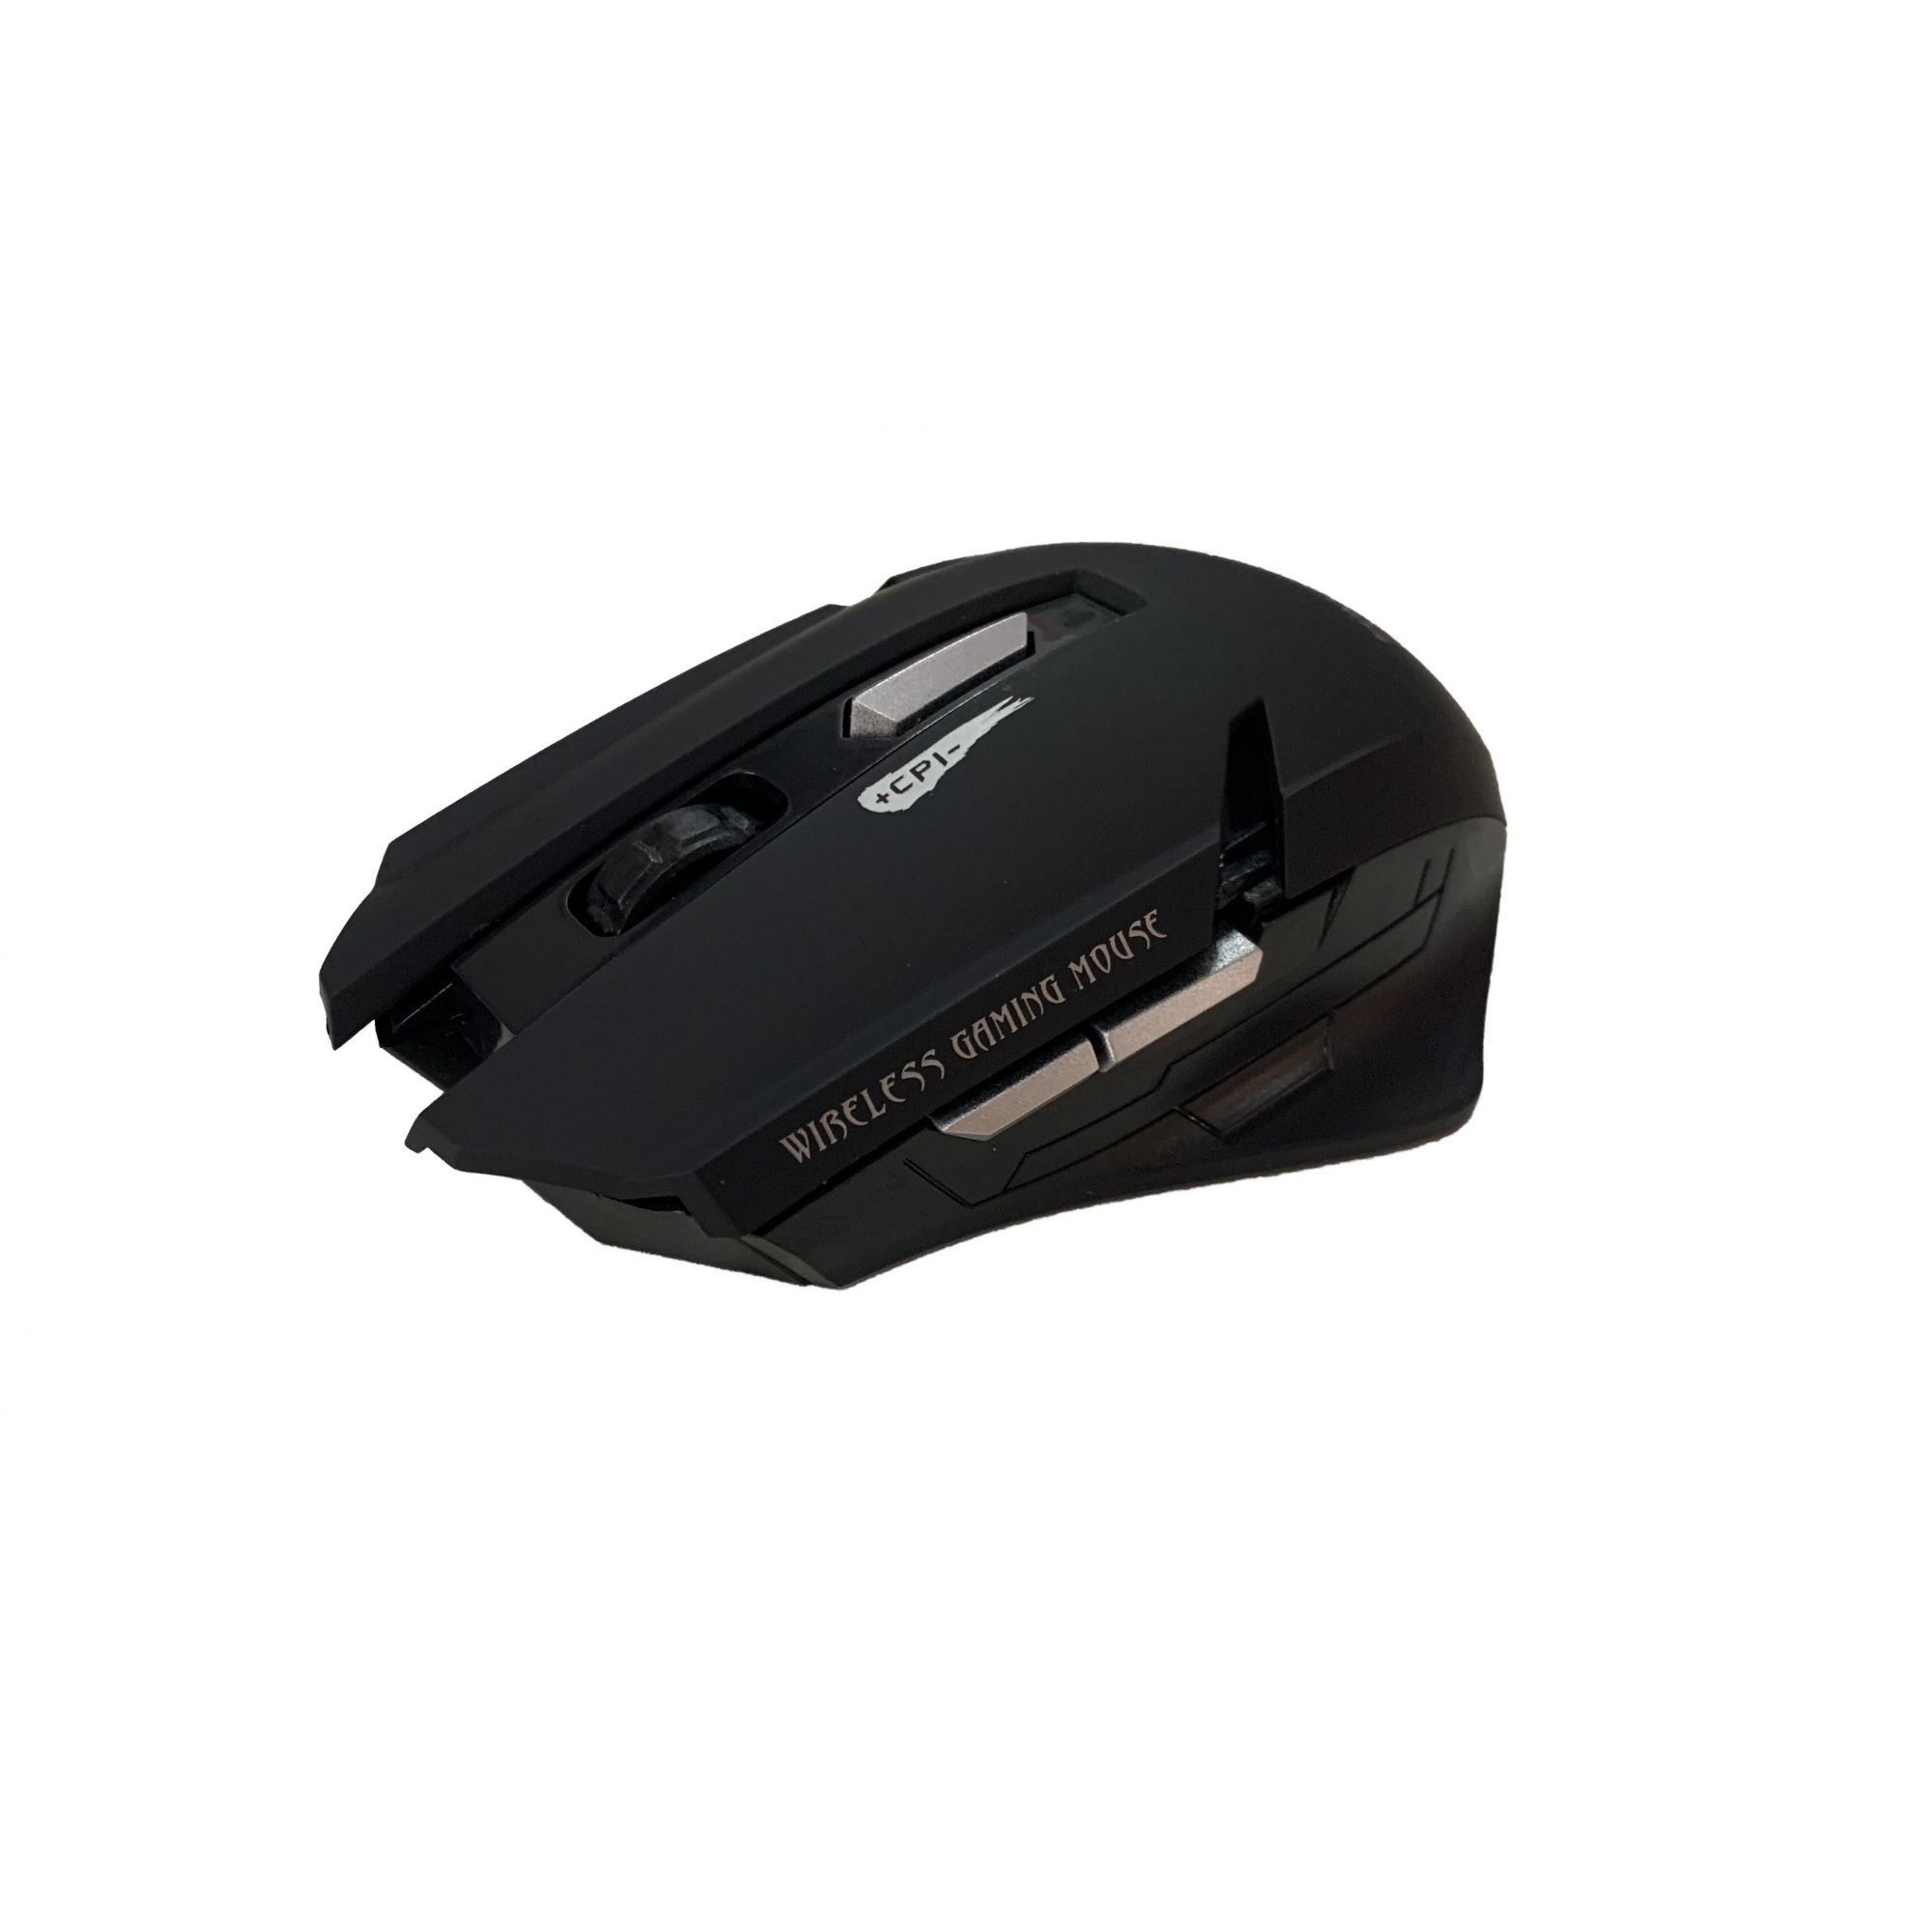 Mouse  Wireless Hmaston 2.4Ghz E-1700